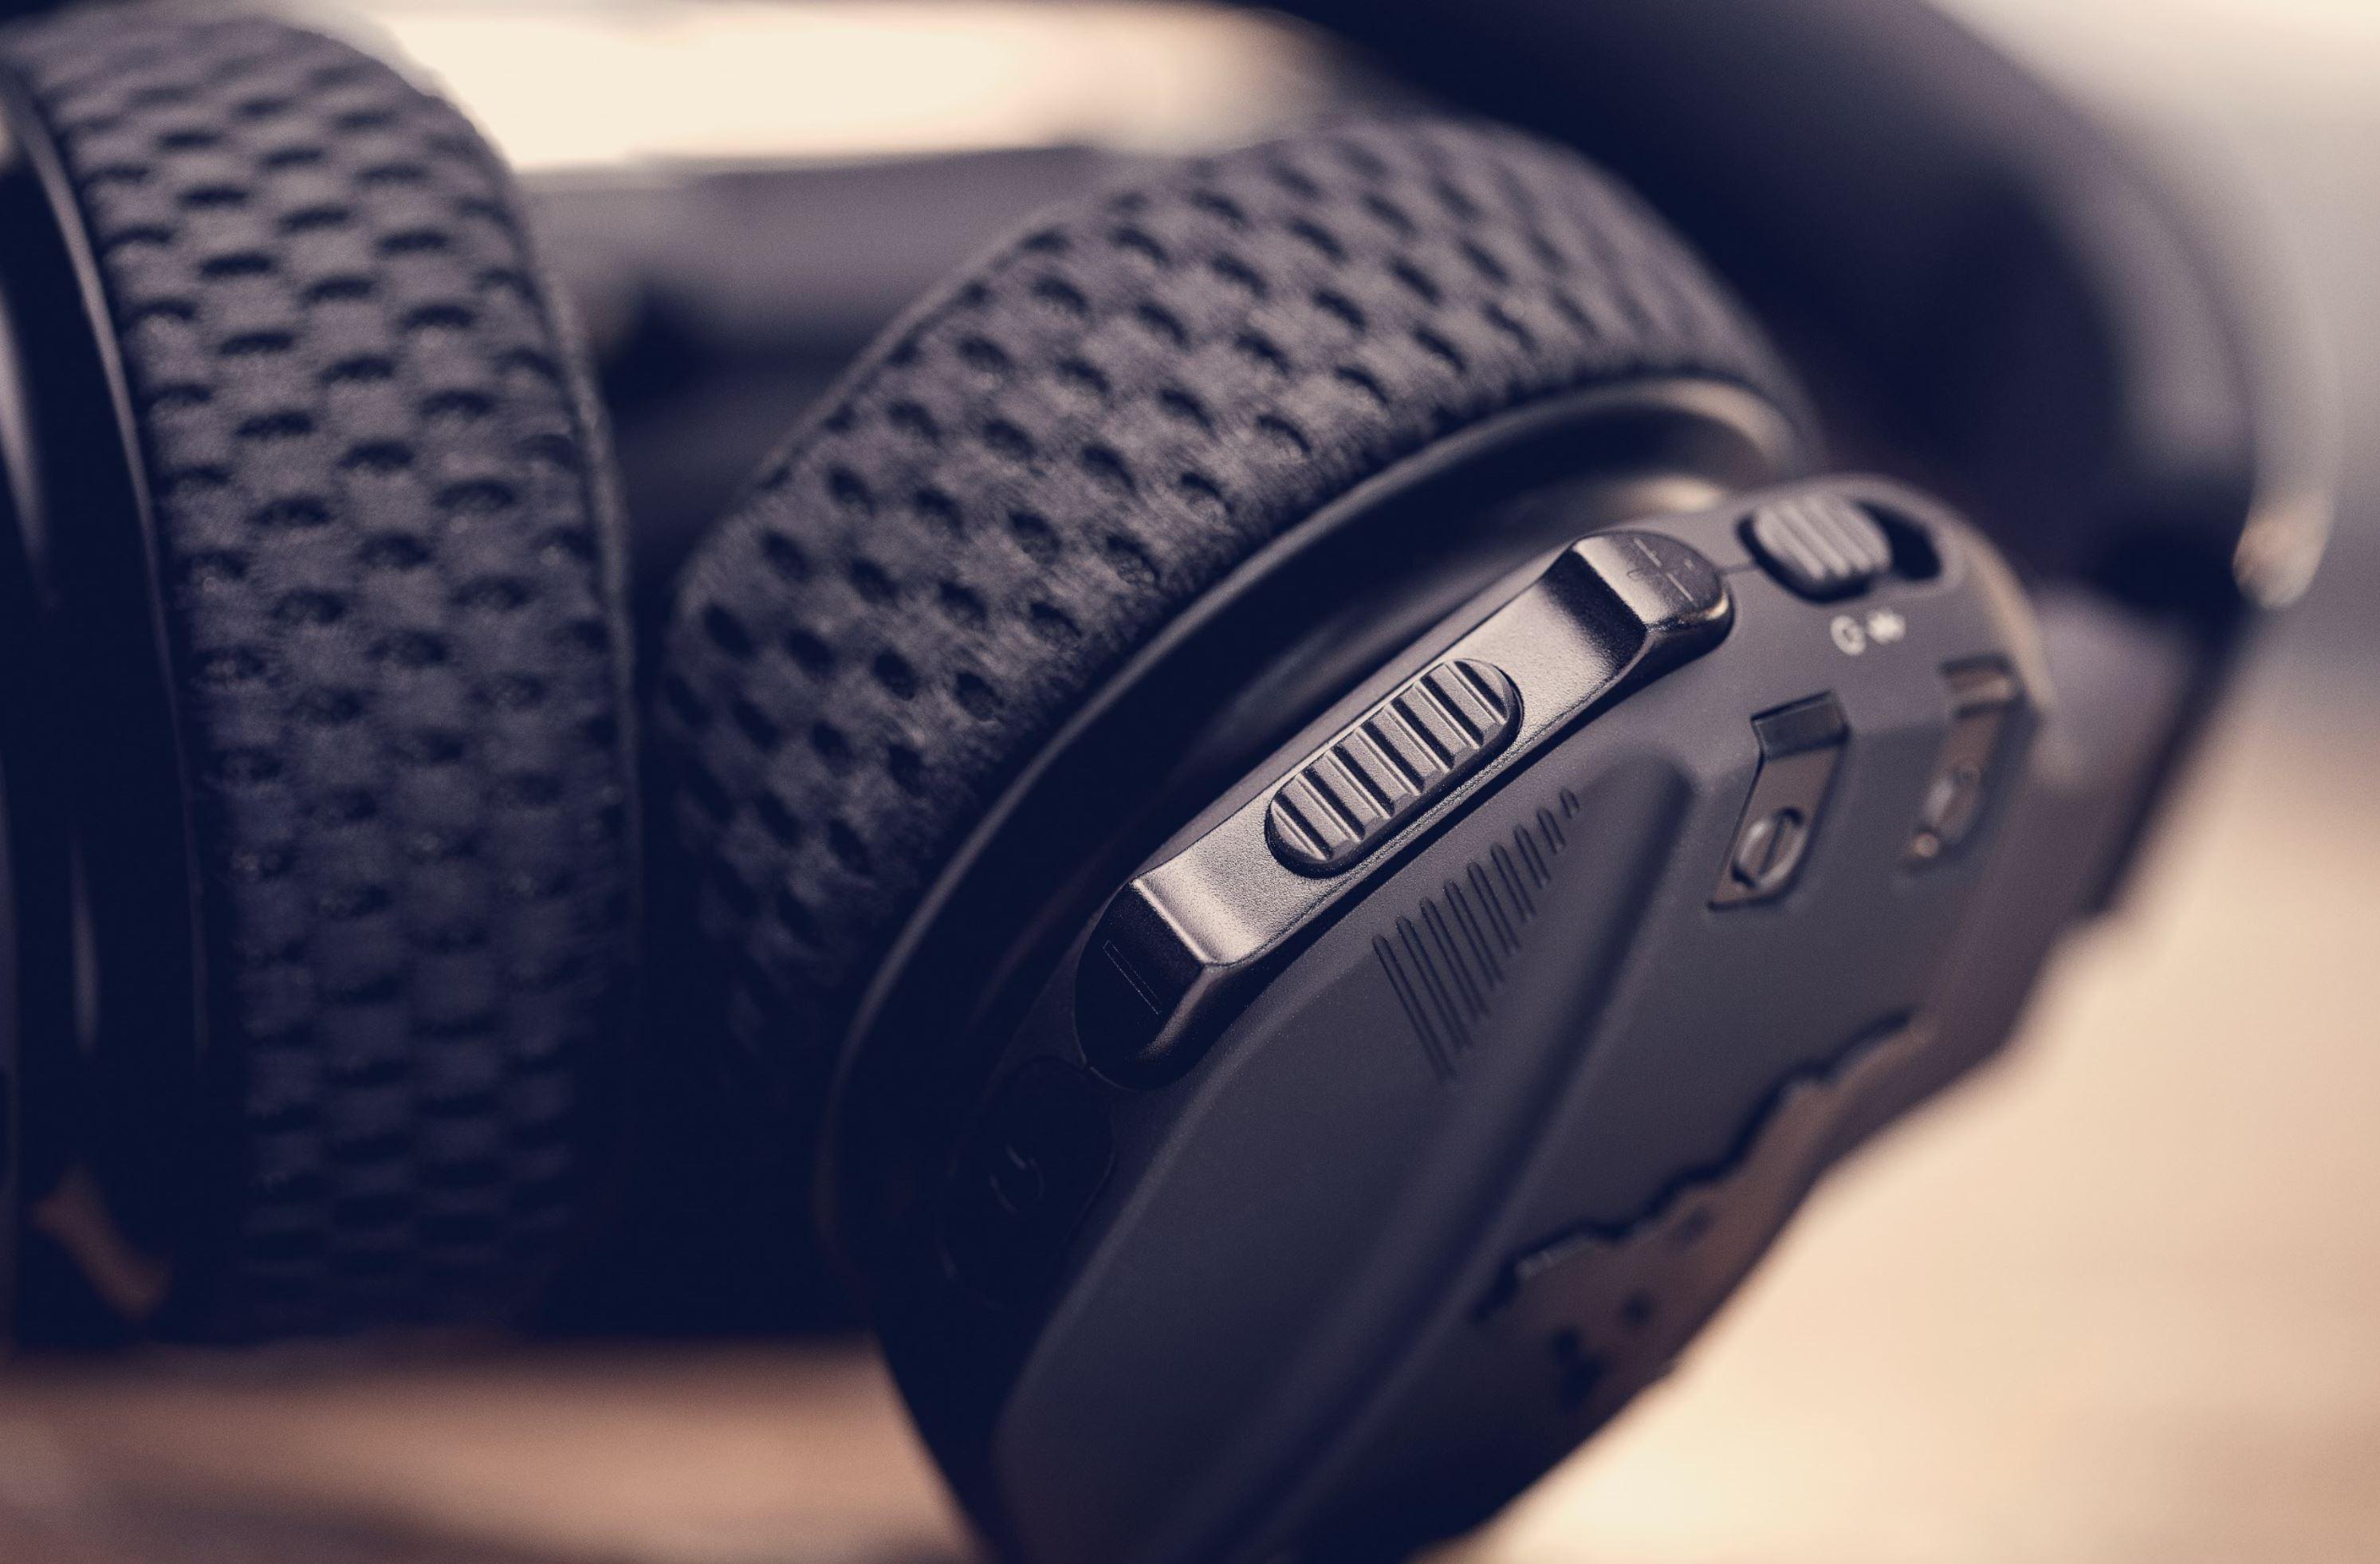 JBL UA Sport Wireless cuptrain Headphones project rock dwayne johnson button